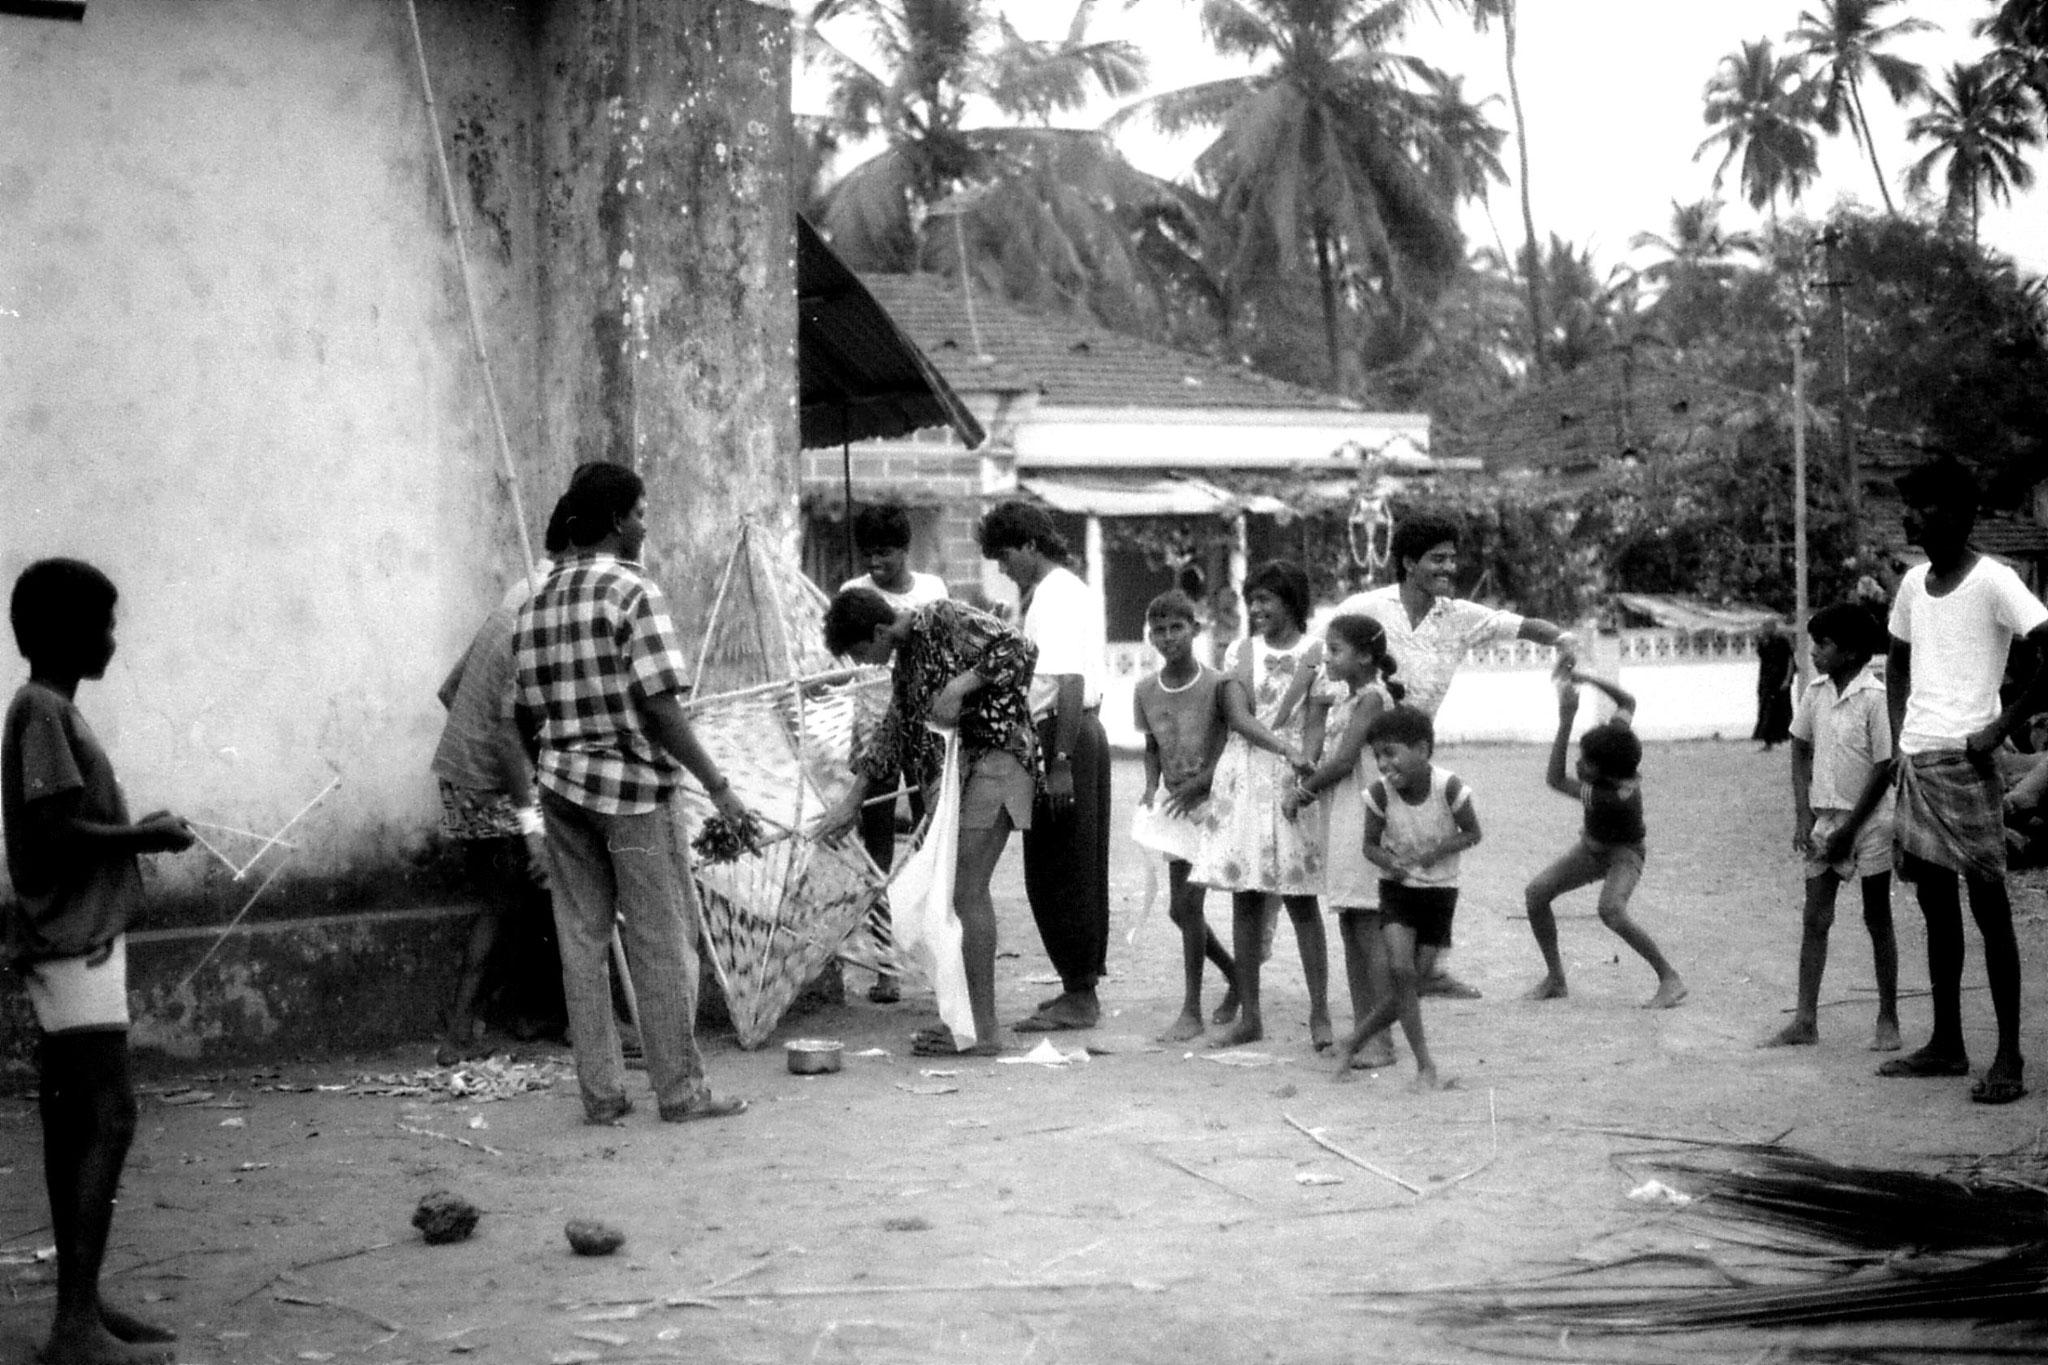 28/12/1989: 33:Siolim Goa, boys making Xmas decorations